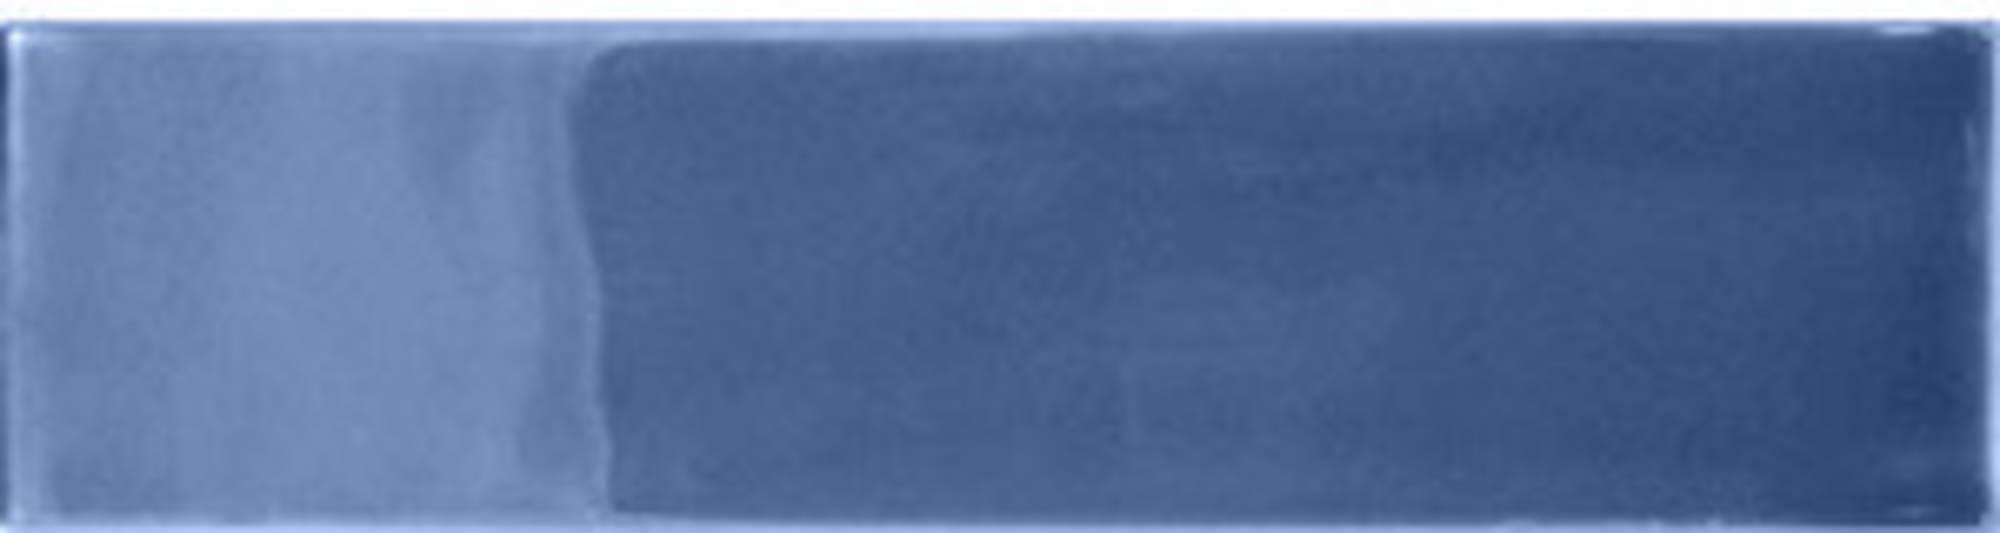 Wandtegel Wow Gradient 7,5x30 cm indigo gloss 0,44 M2